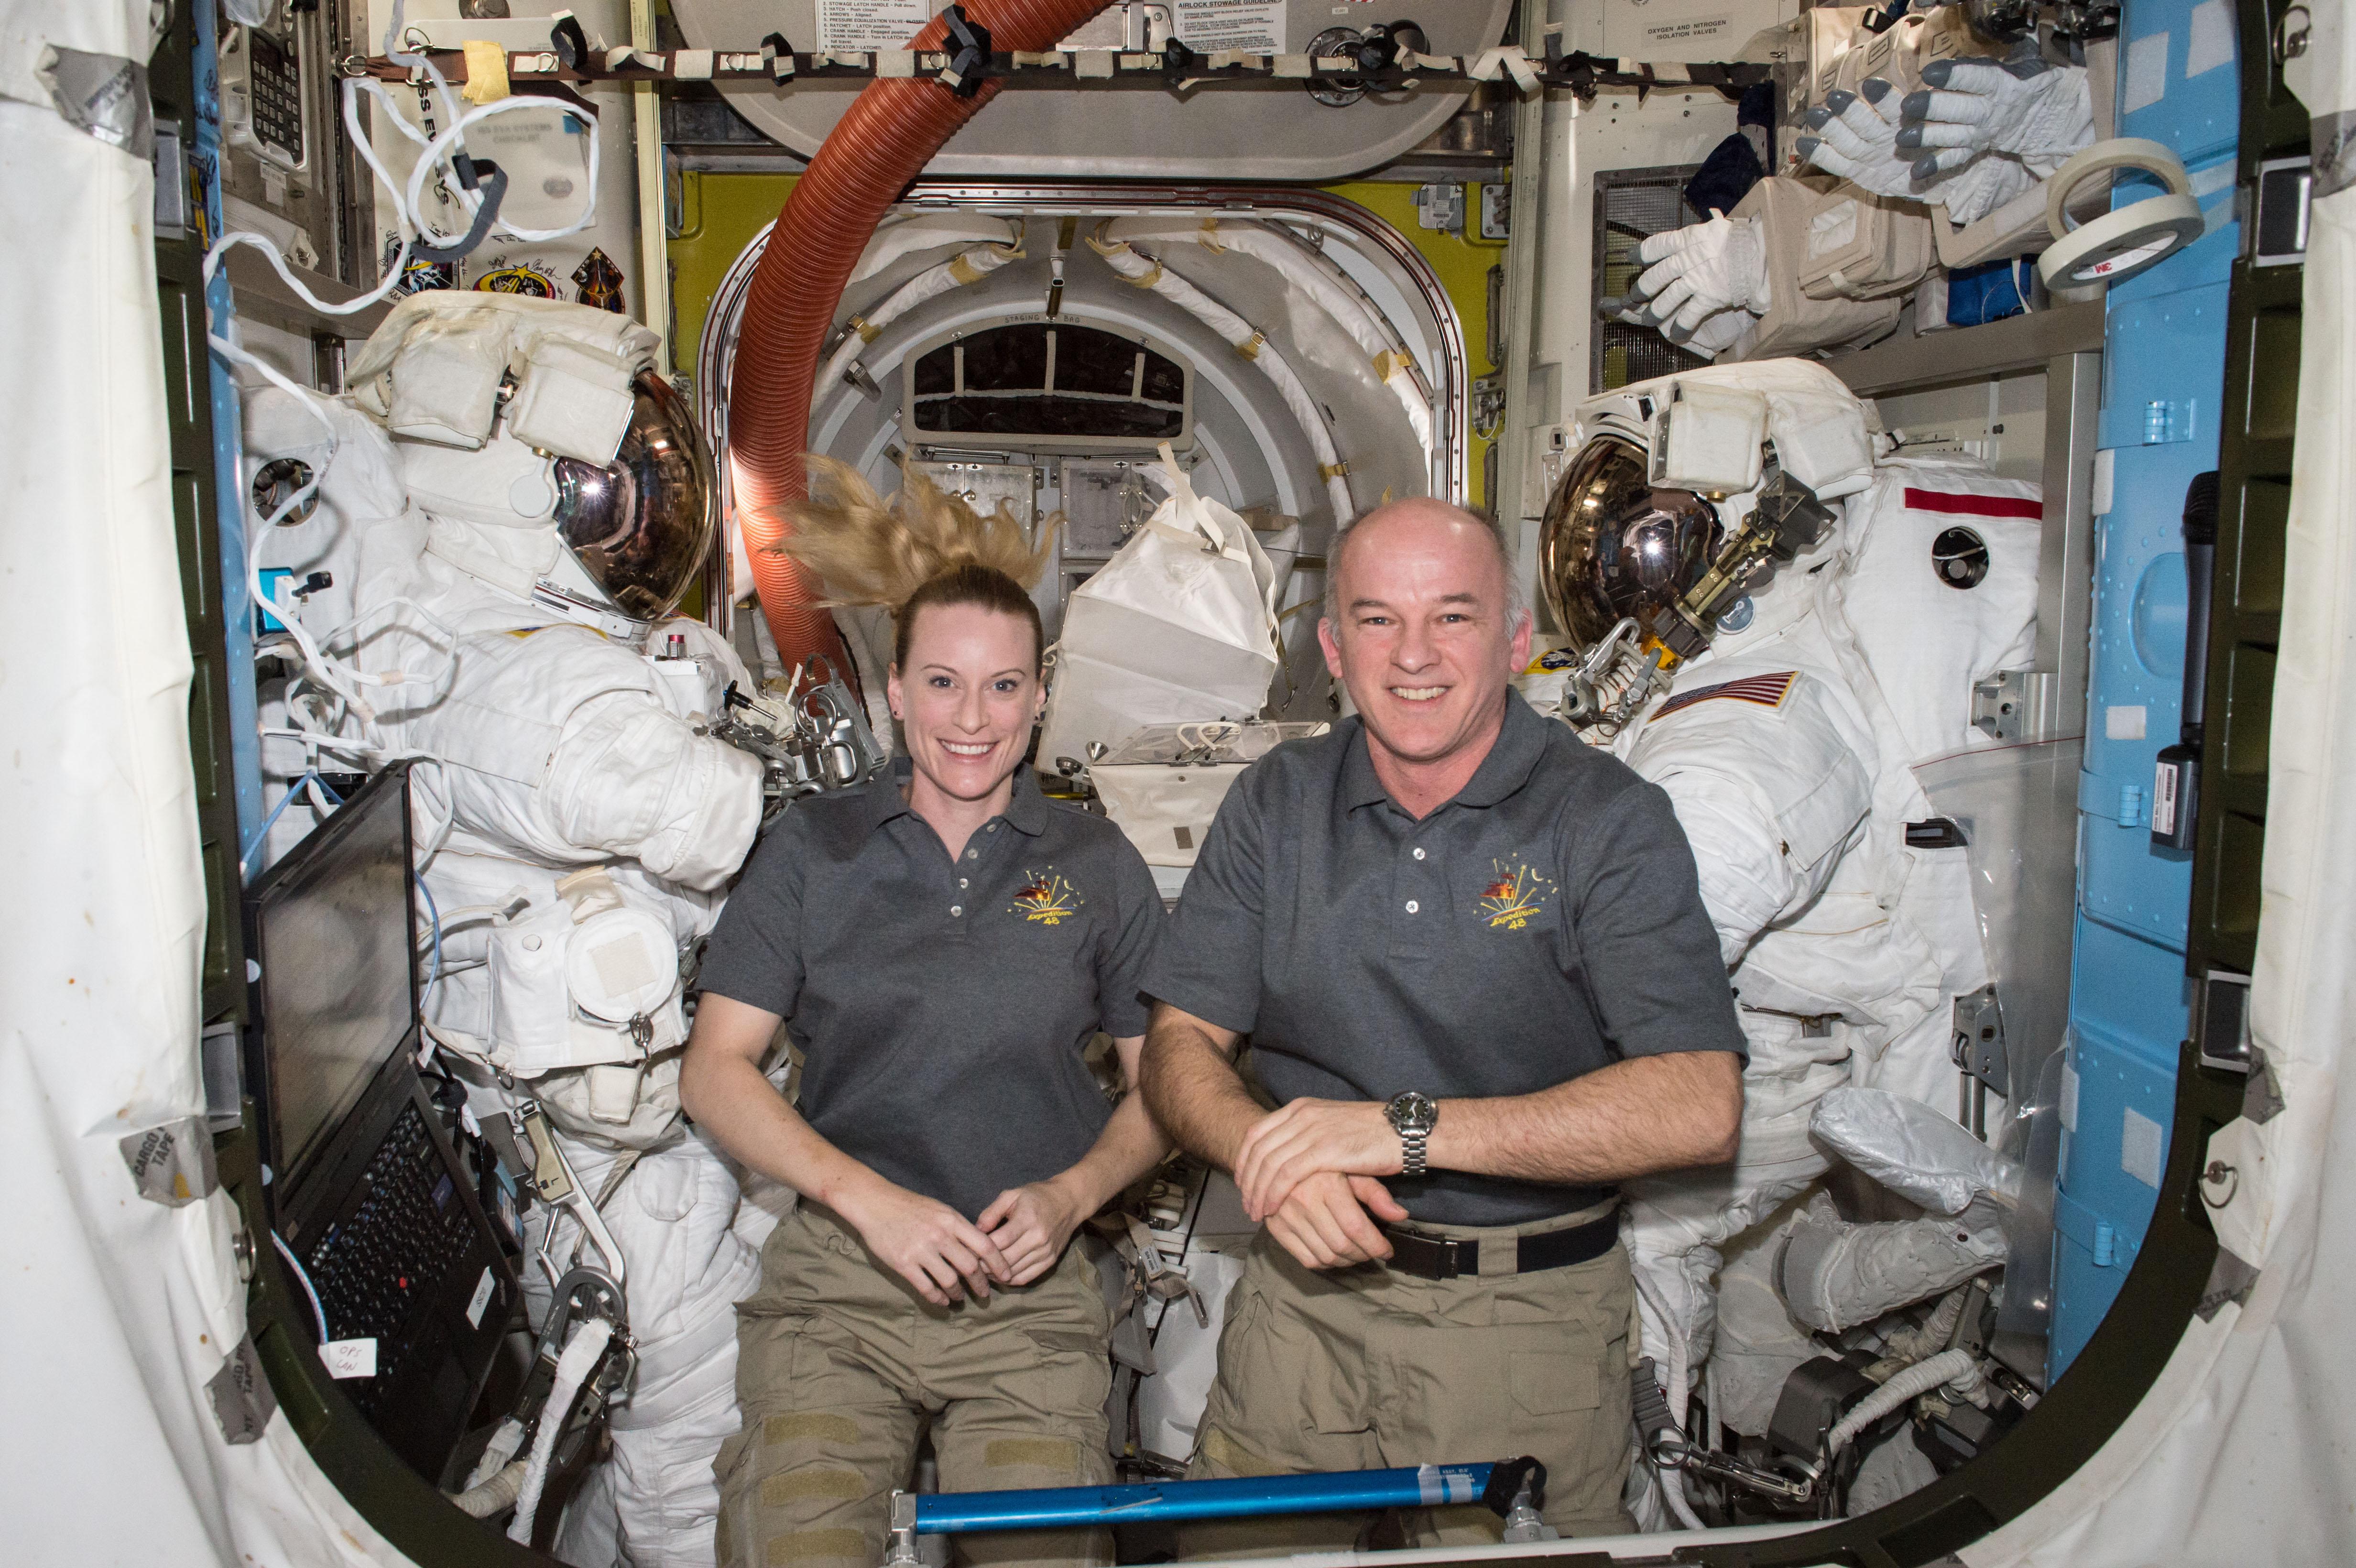 Astronauts Kate Rubins and Jeff Williams